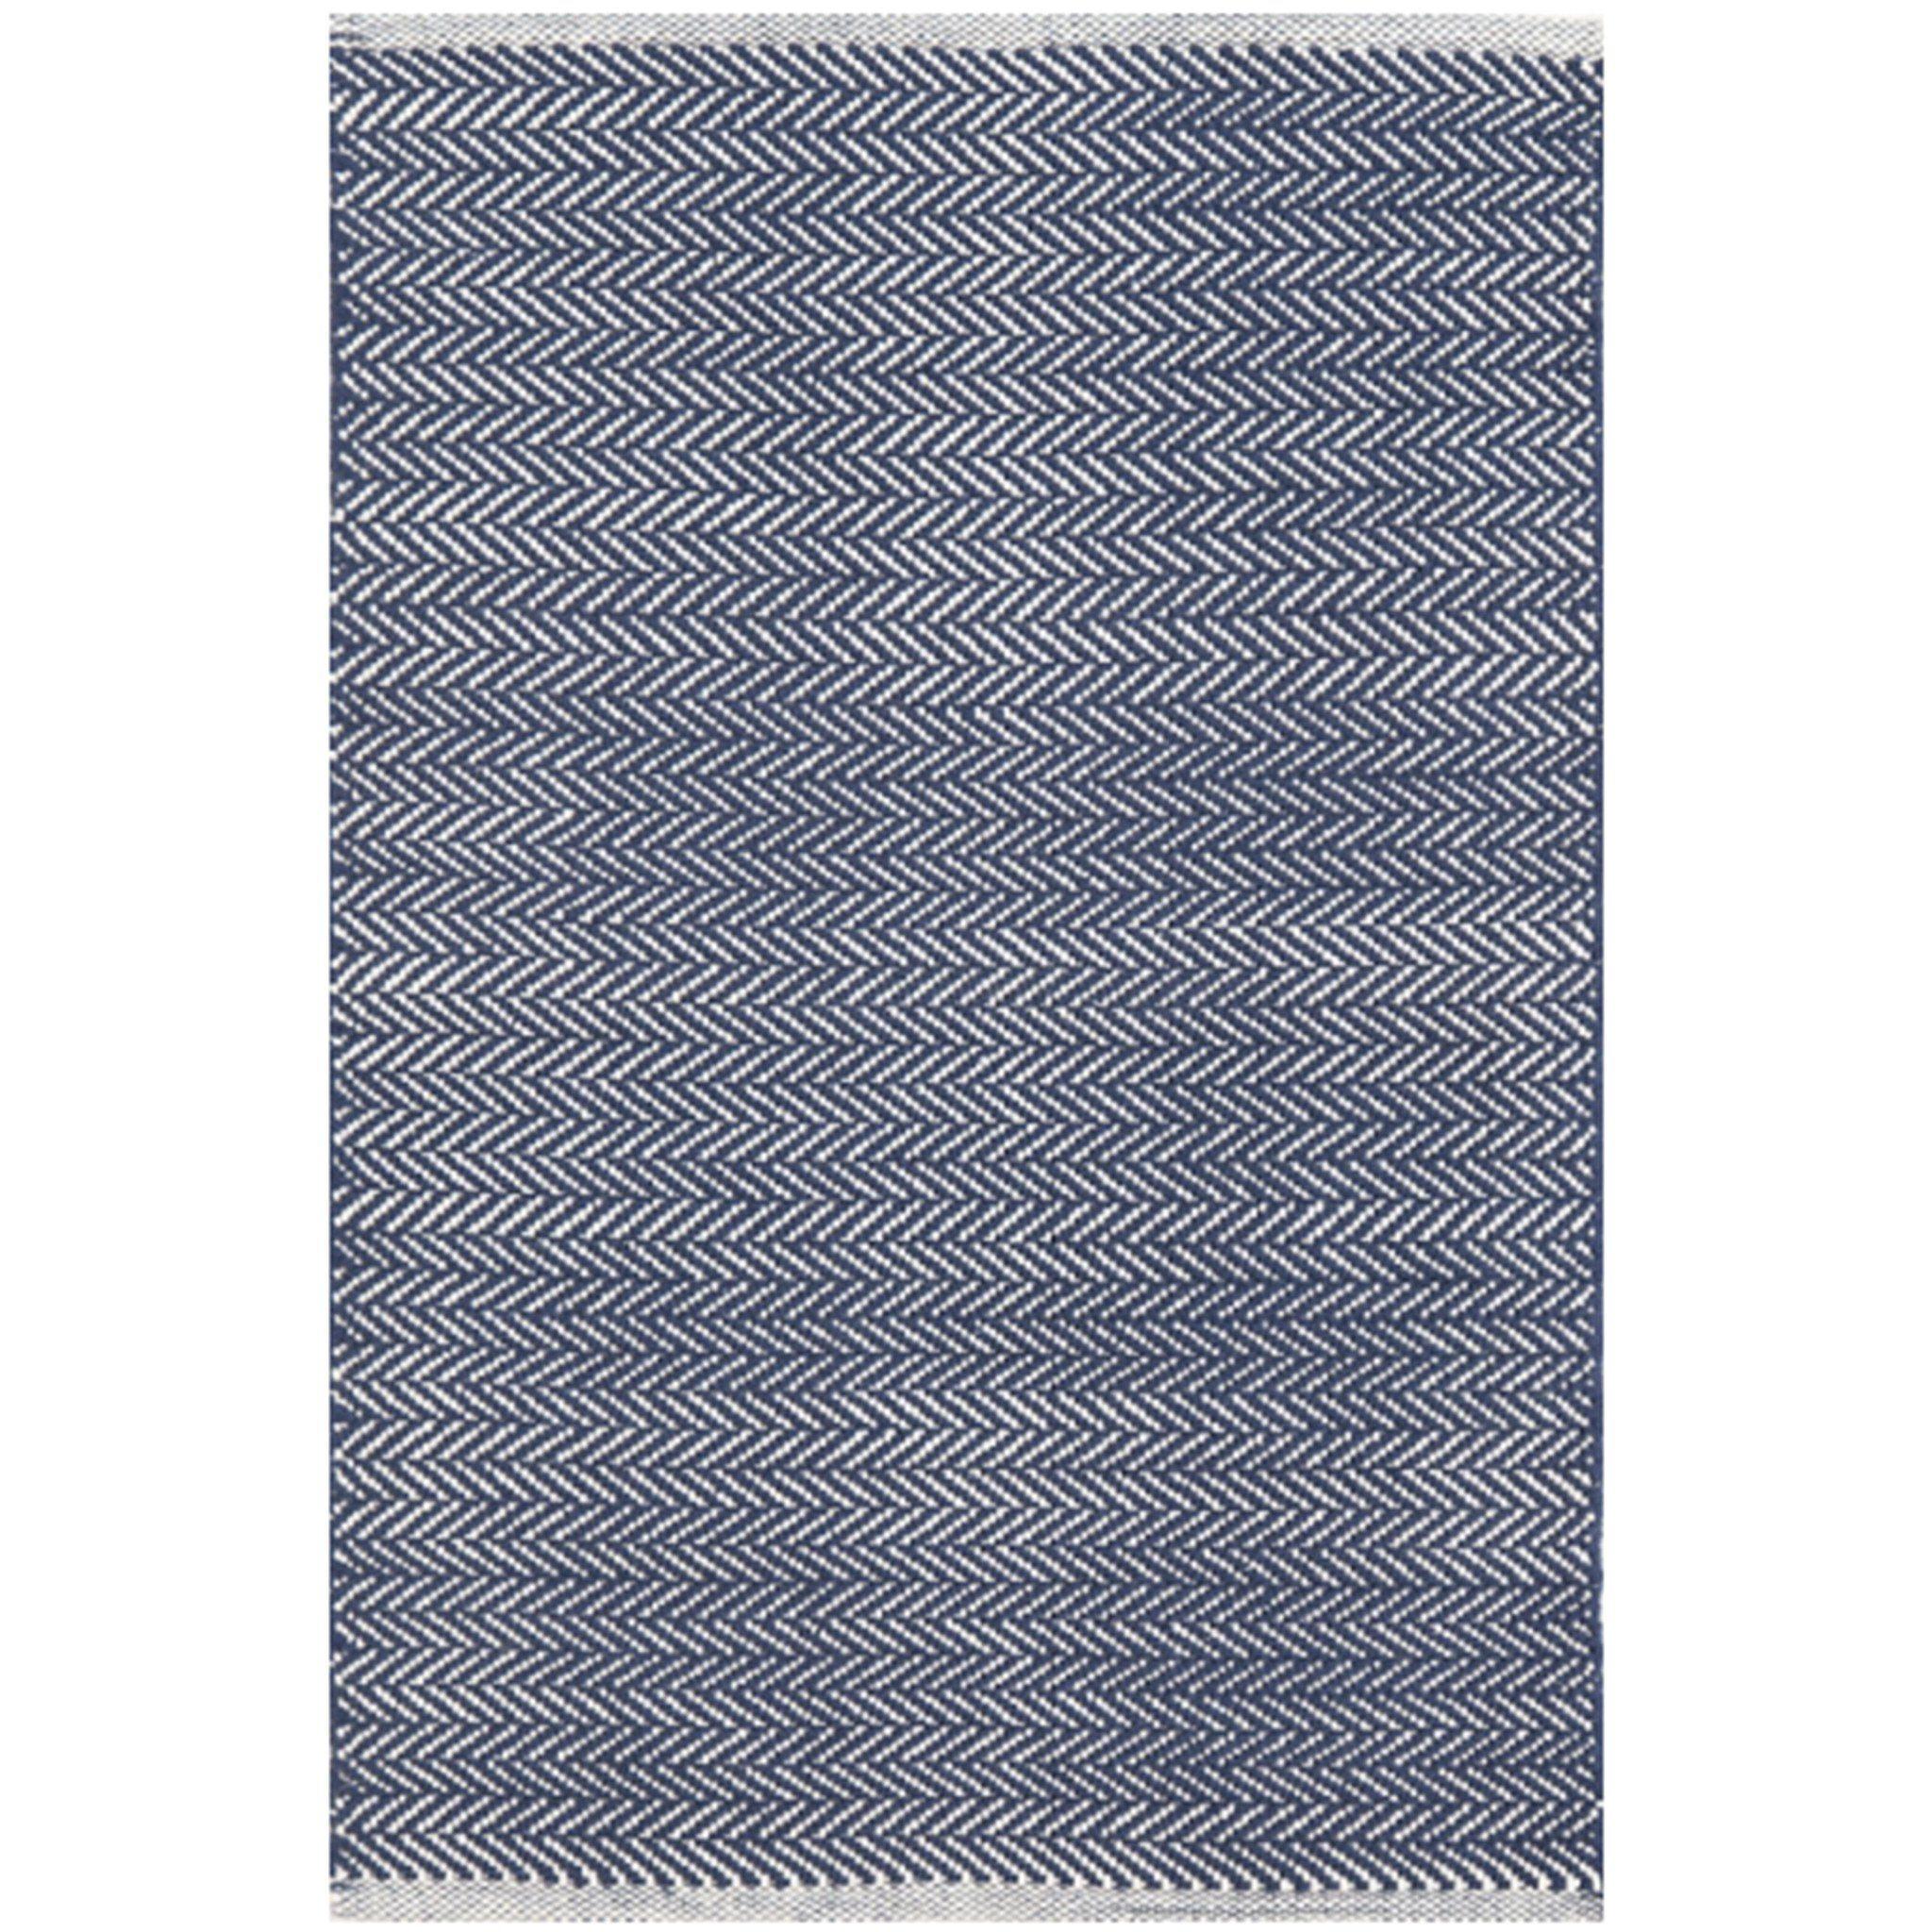 Herringbone Woven Cotton Rug